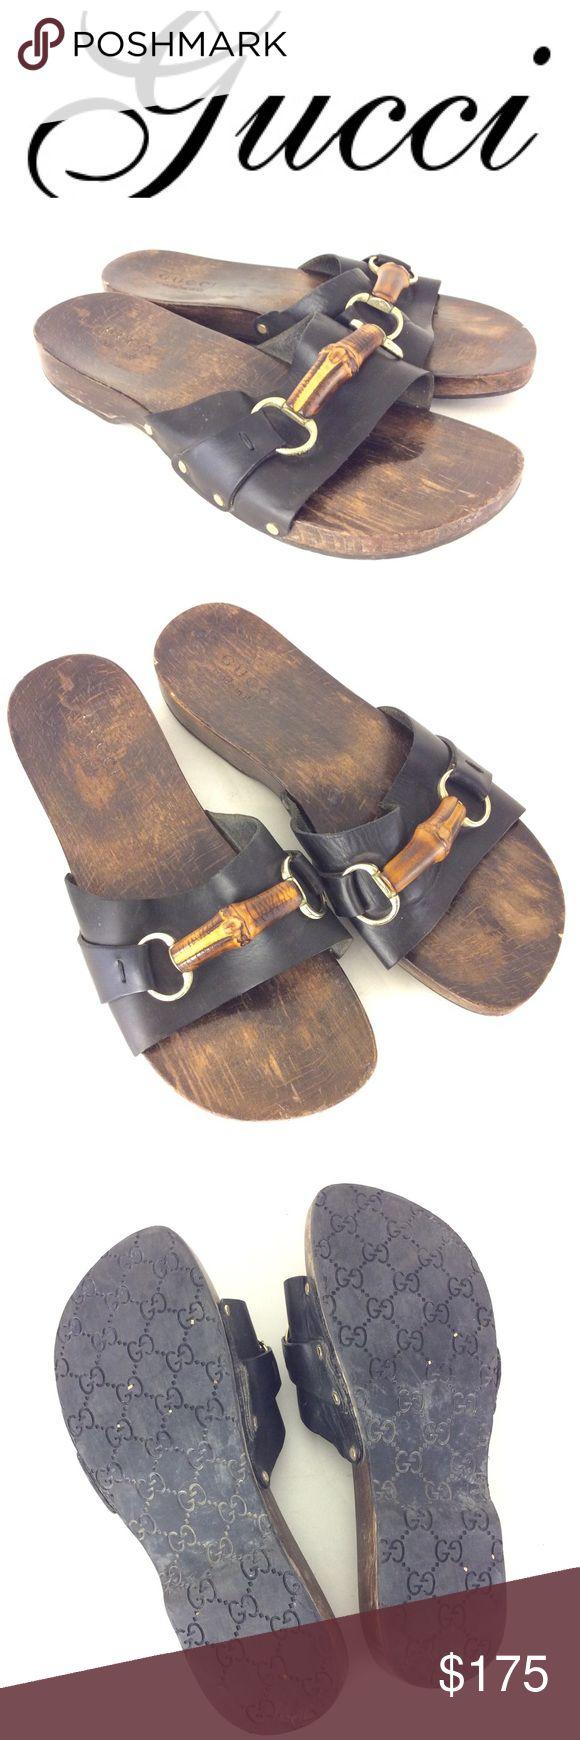 GUCCI horsebit wood Sandals 9.5 10 men's Guaranteed Authentic  brown leather wood sandals by GUCCI. No size tag . Should fit men's 9.5 10. Gucci Shoes Sandals & Flip-Flops